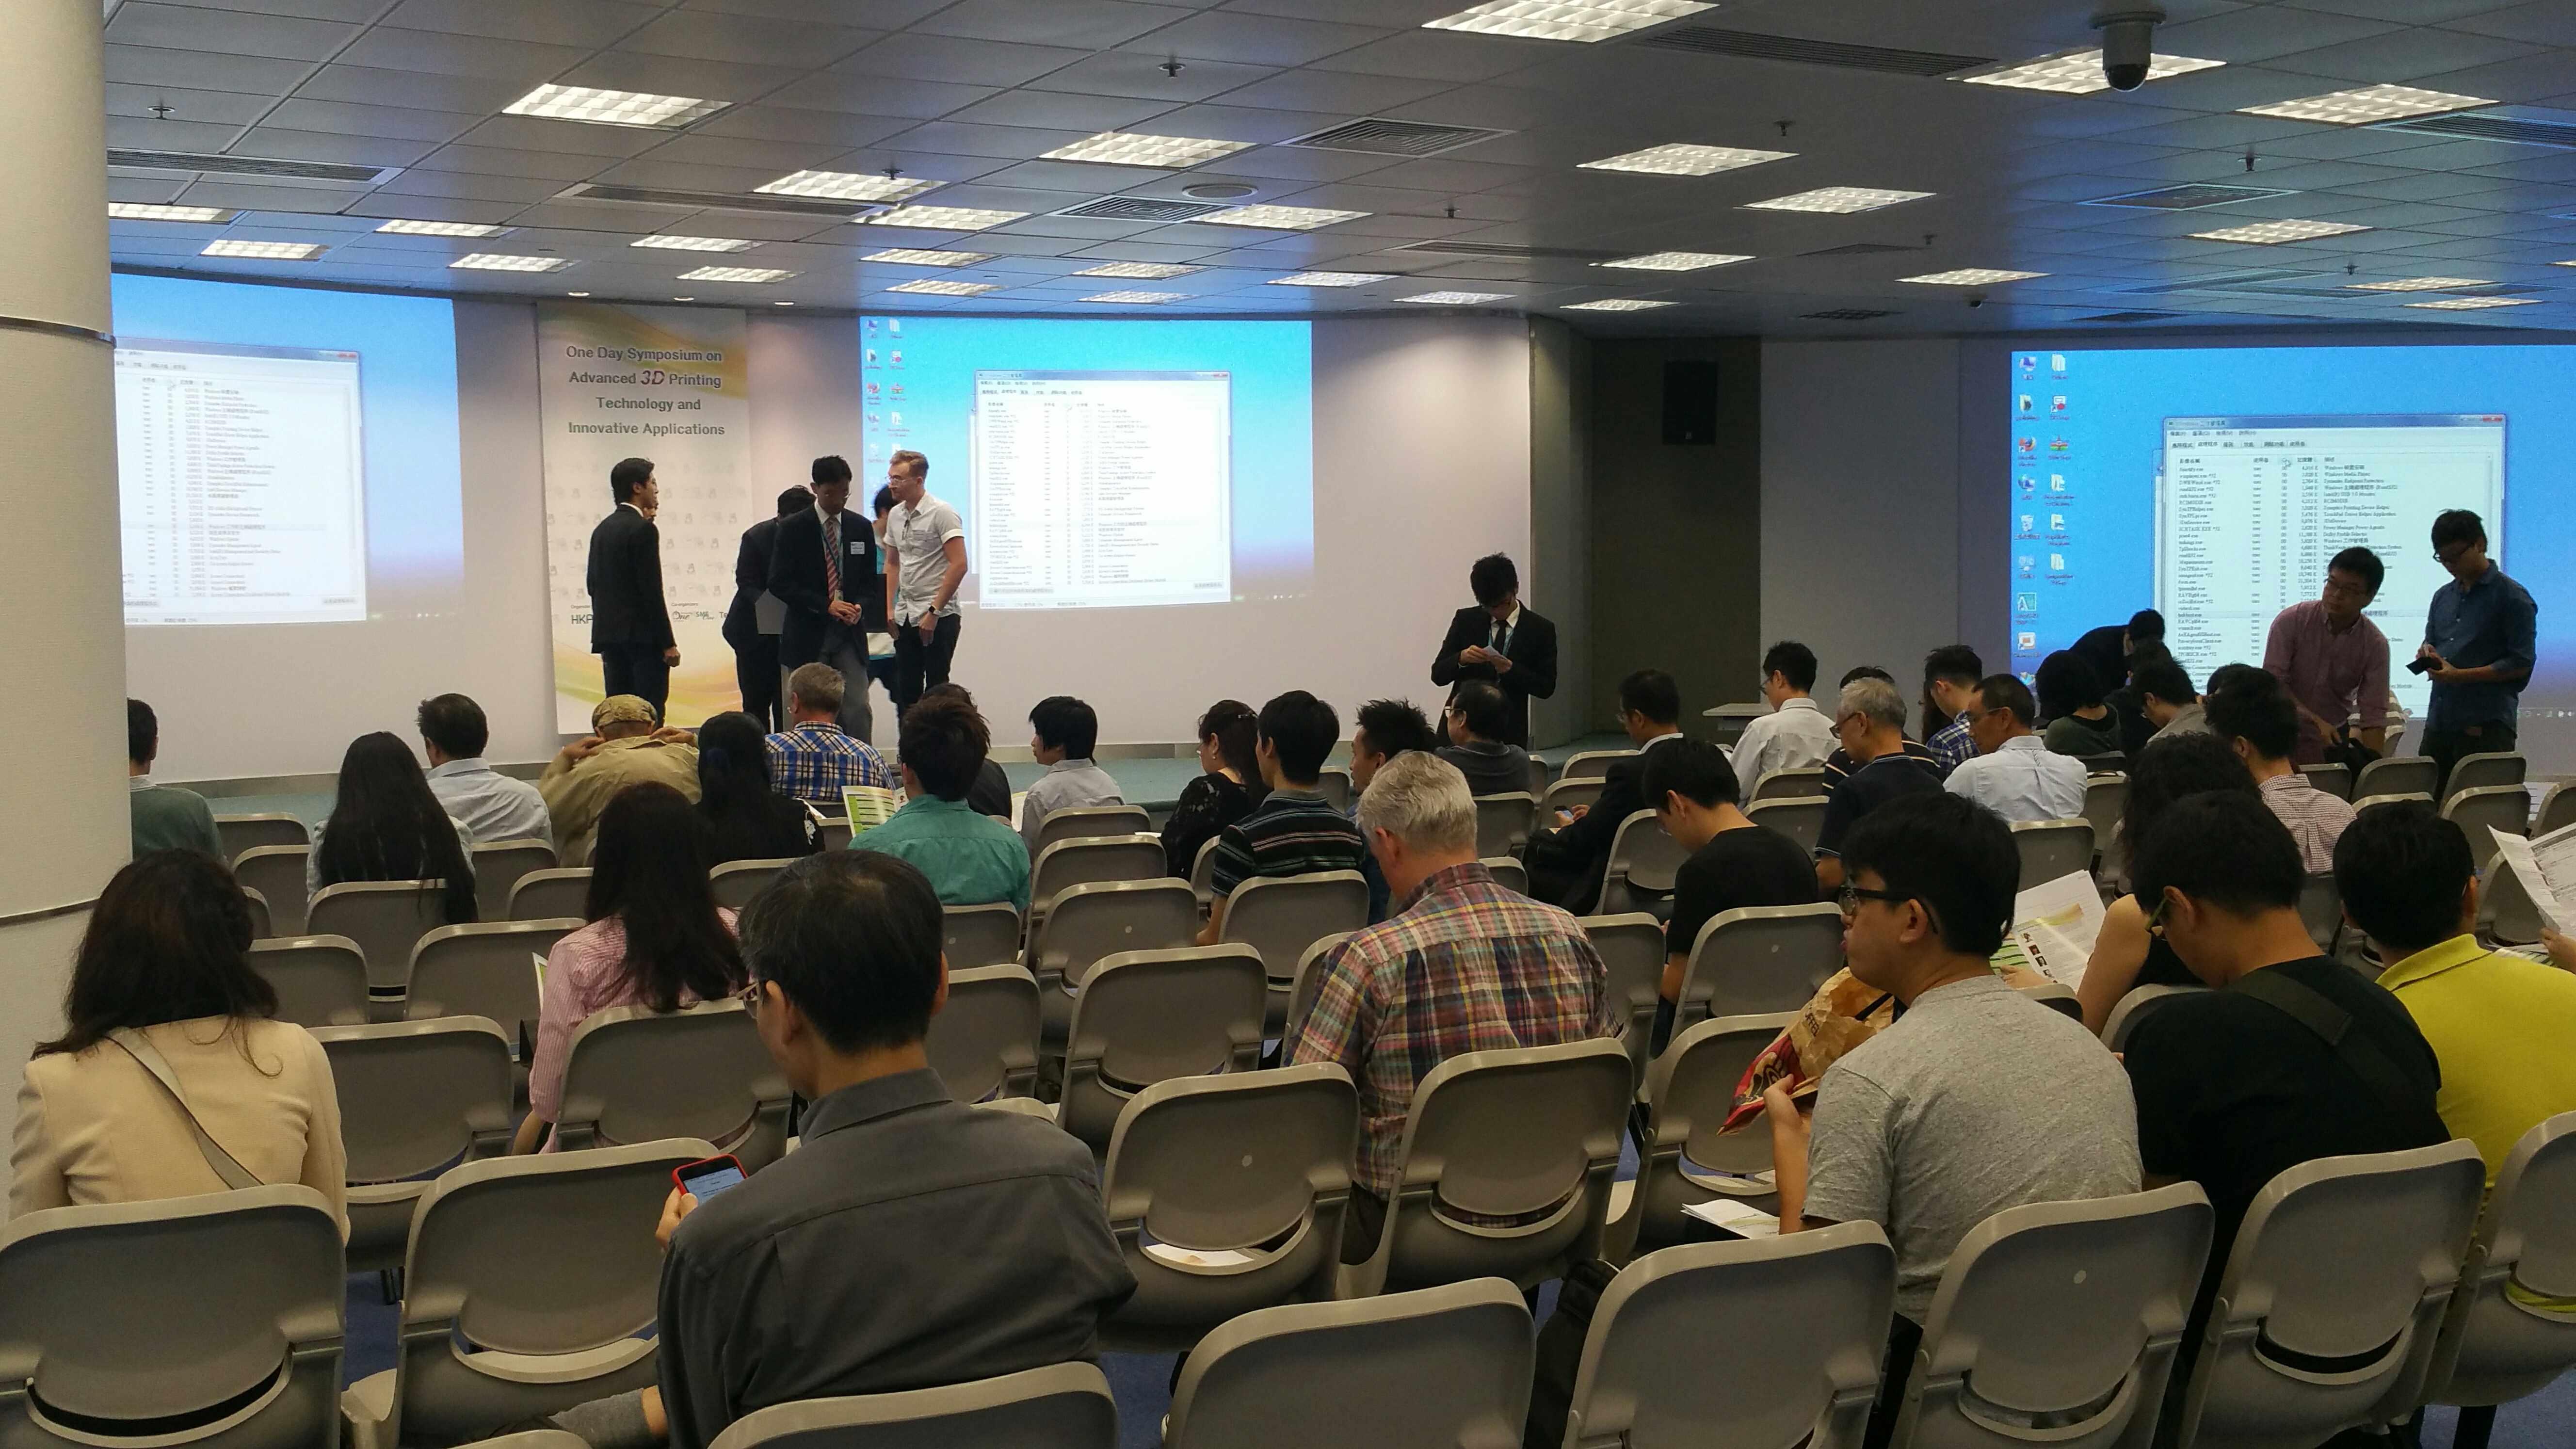 3Dponics Guest Speaker at 3D Printing Symposium in Hong Kong